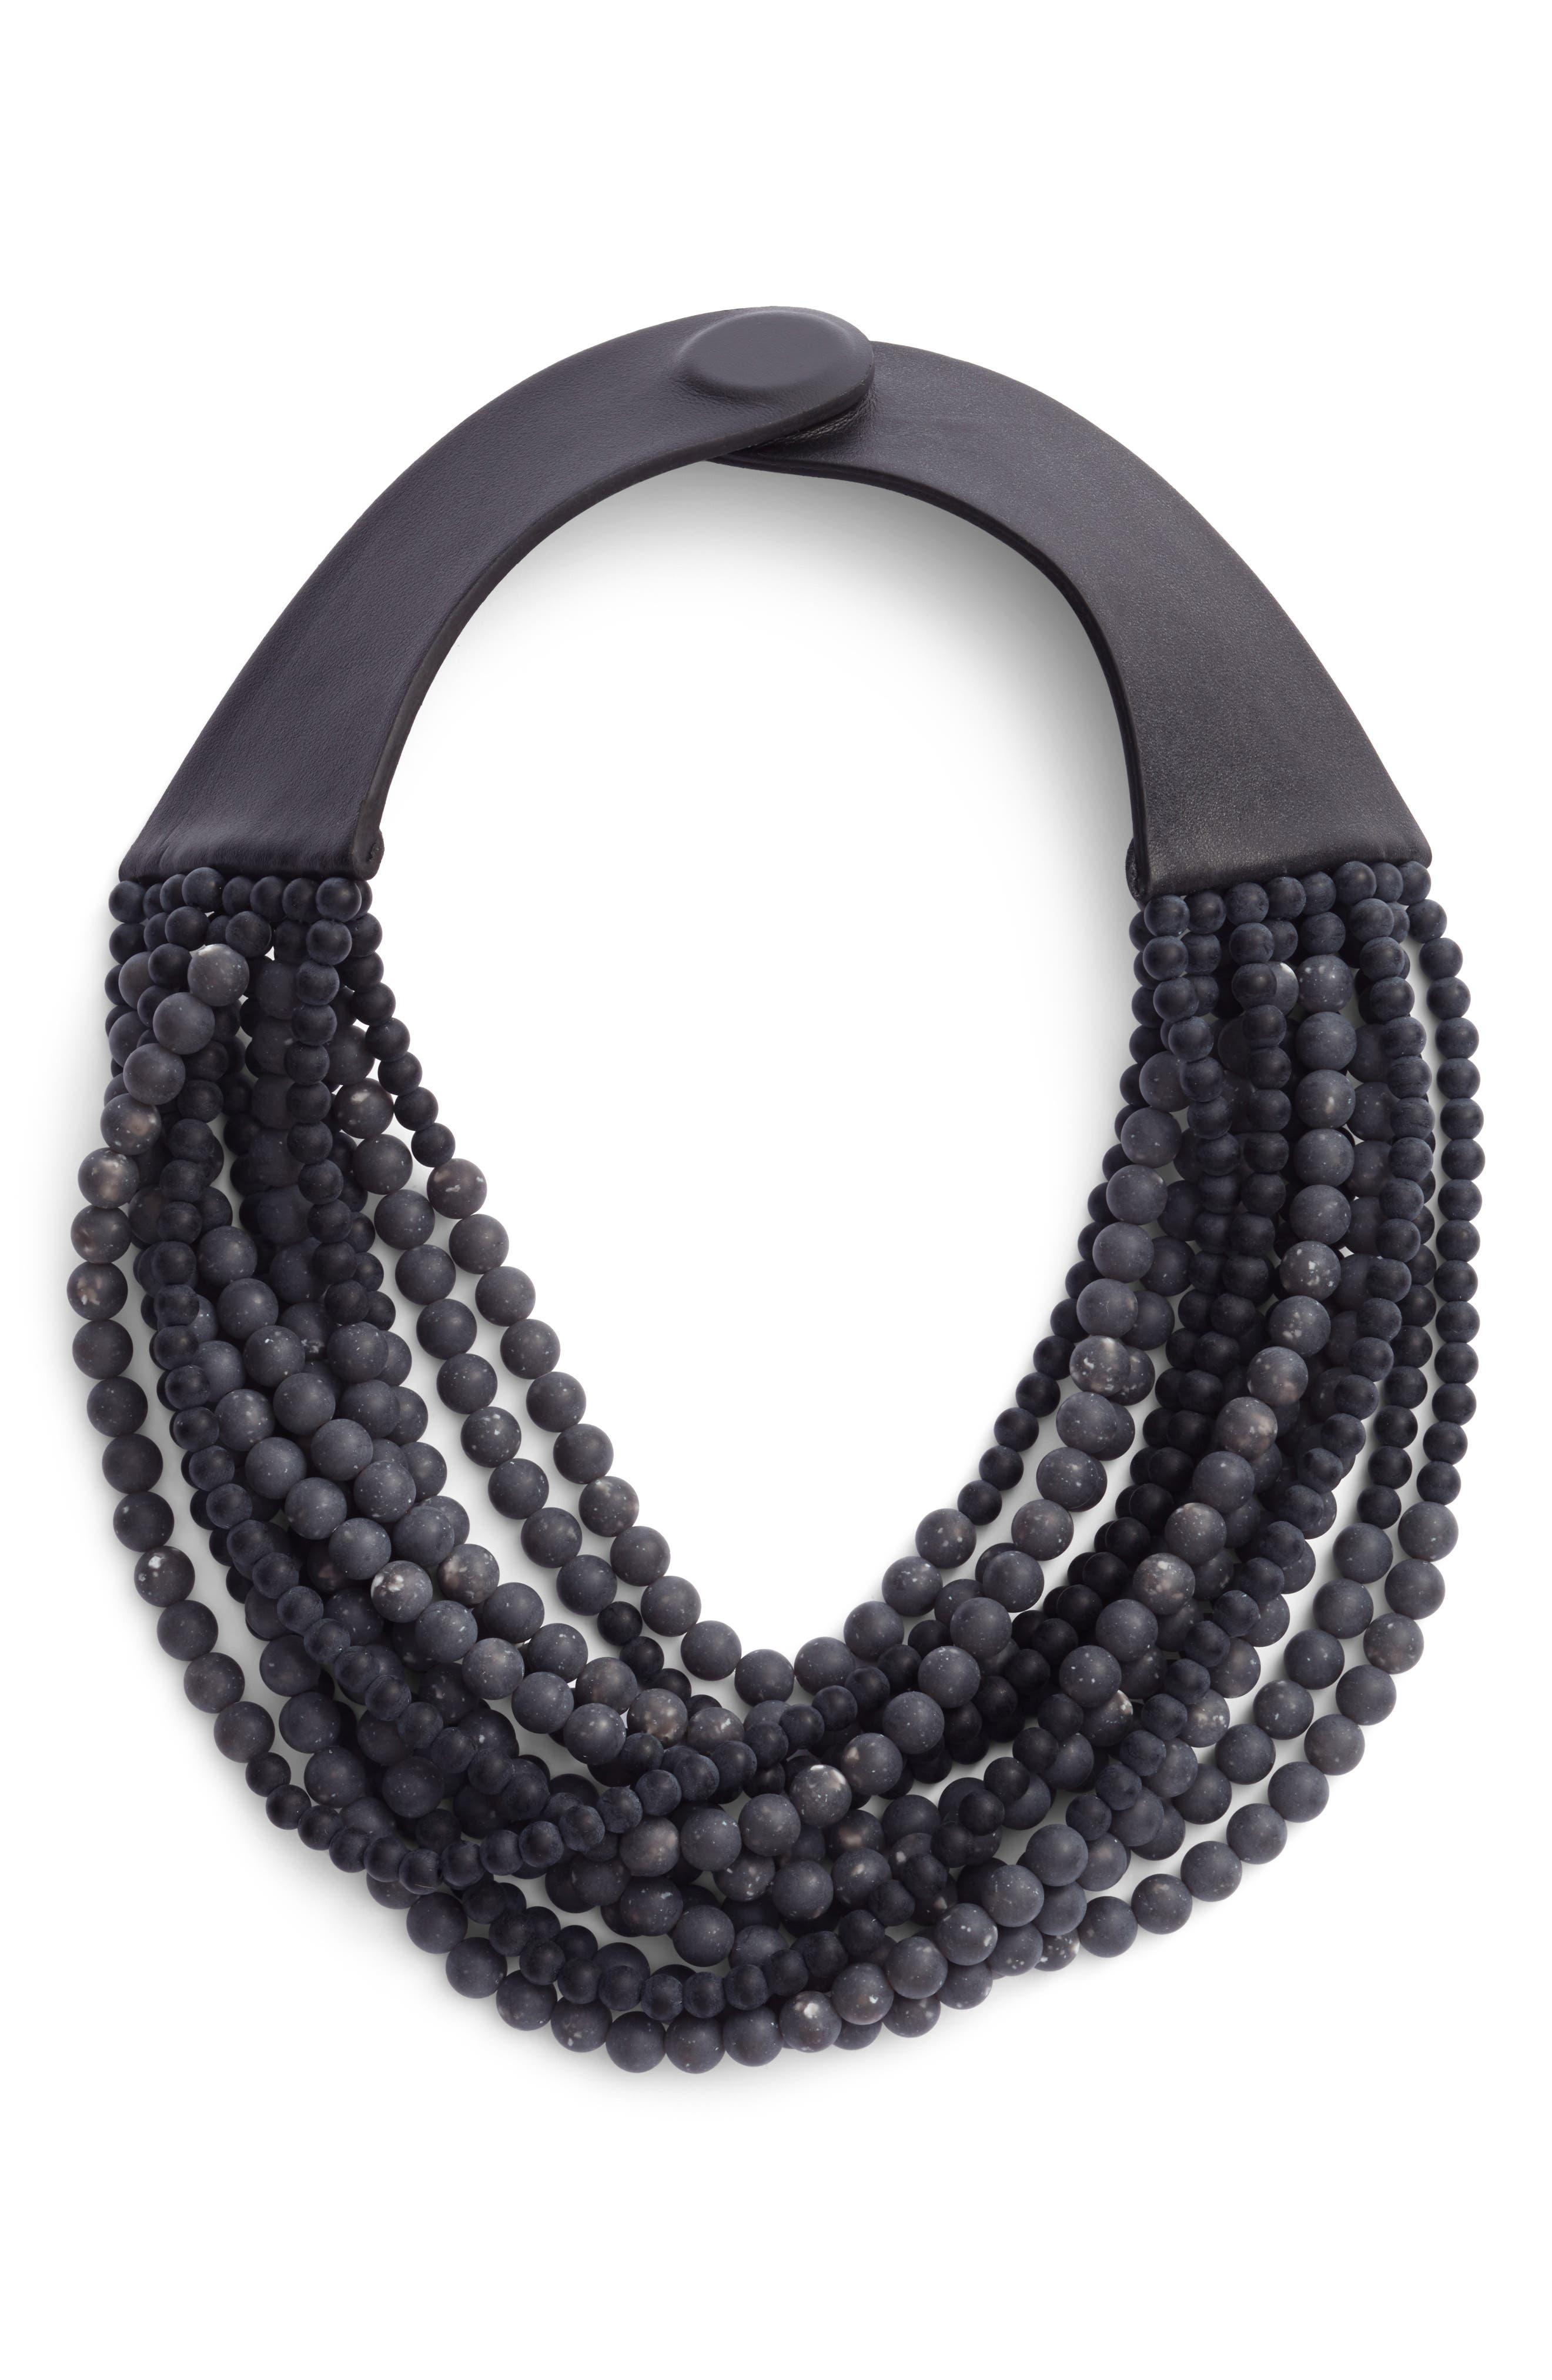 Fairchild Baldwin Beaded Collar Necklace